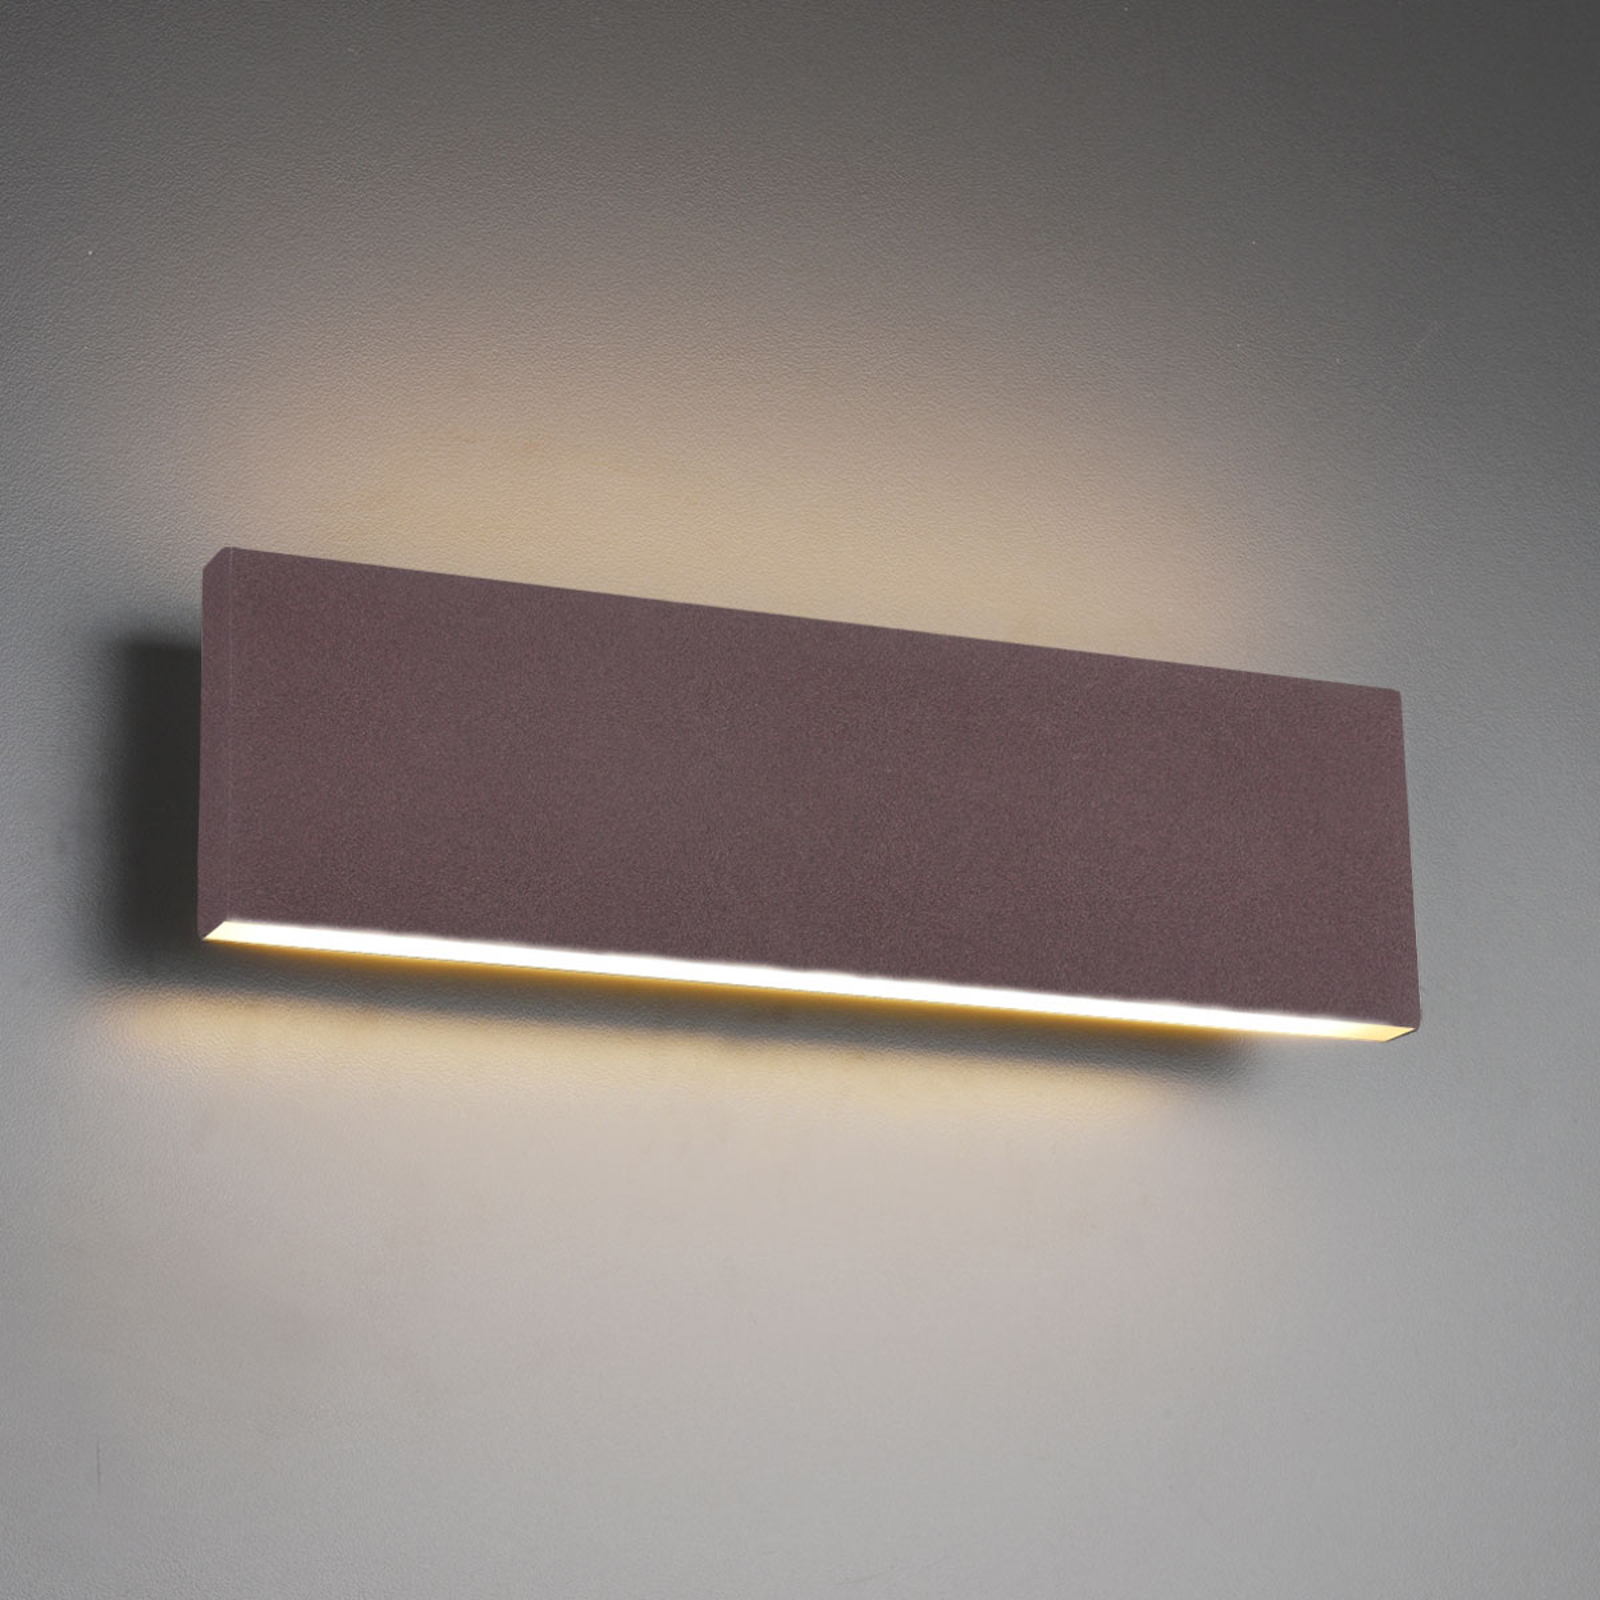 LED-vegglampe Concha 28 cm, rust